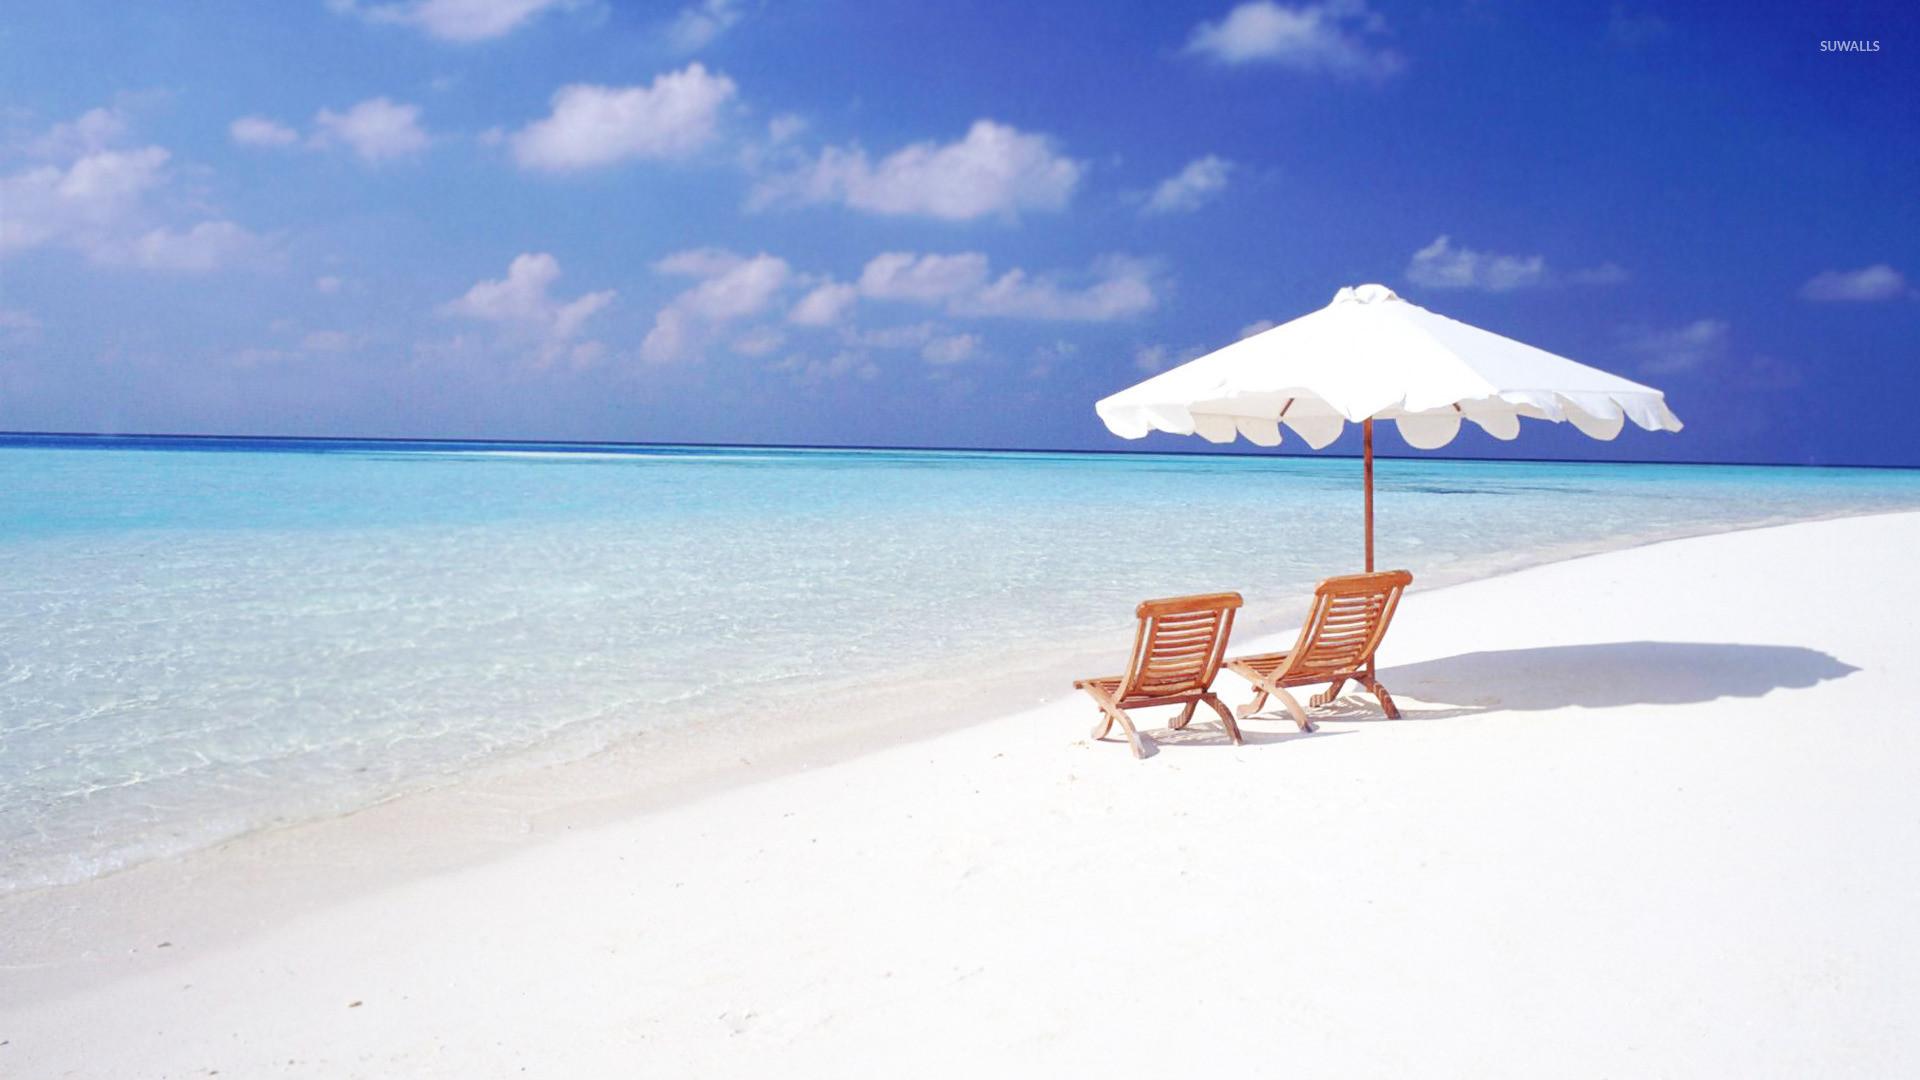 Maldives wallpaper – Beach wallpapers – #14028